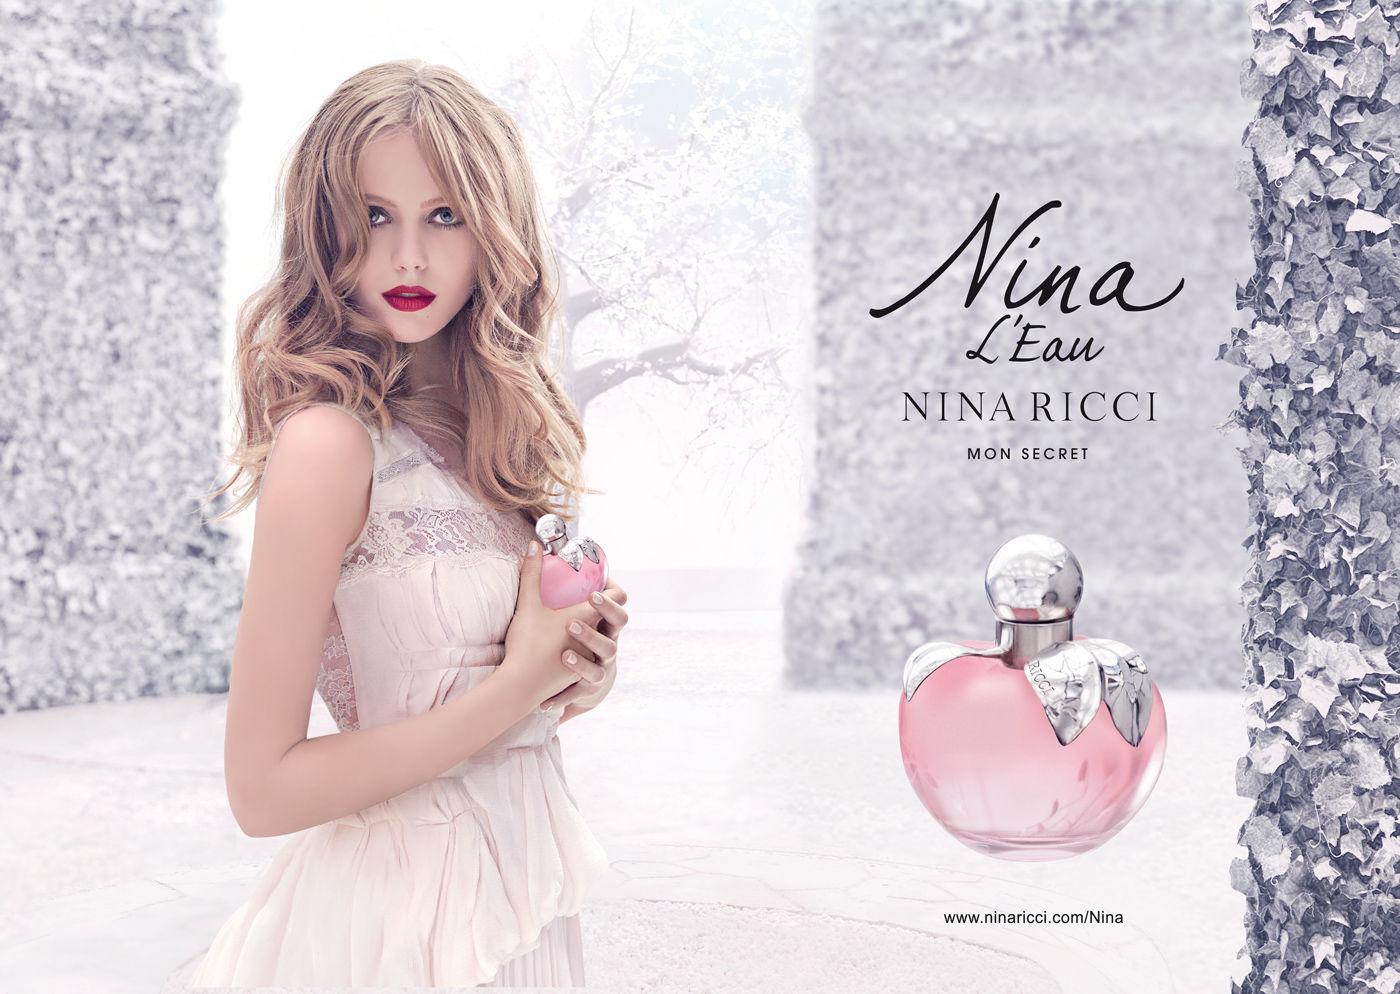 Nina Ricci 继承人成为瑞士汇丰泄密丑闻后首位受制裁的名人